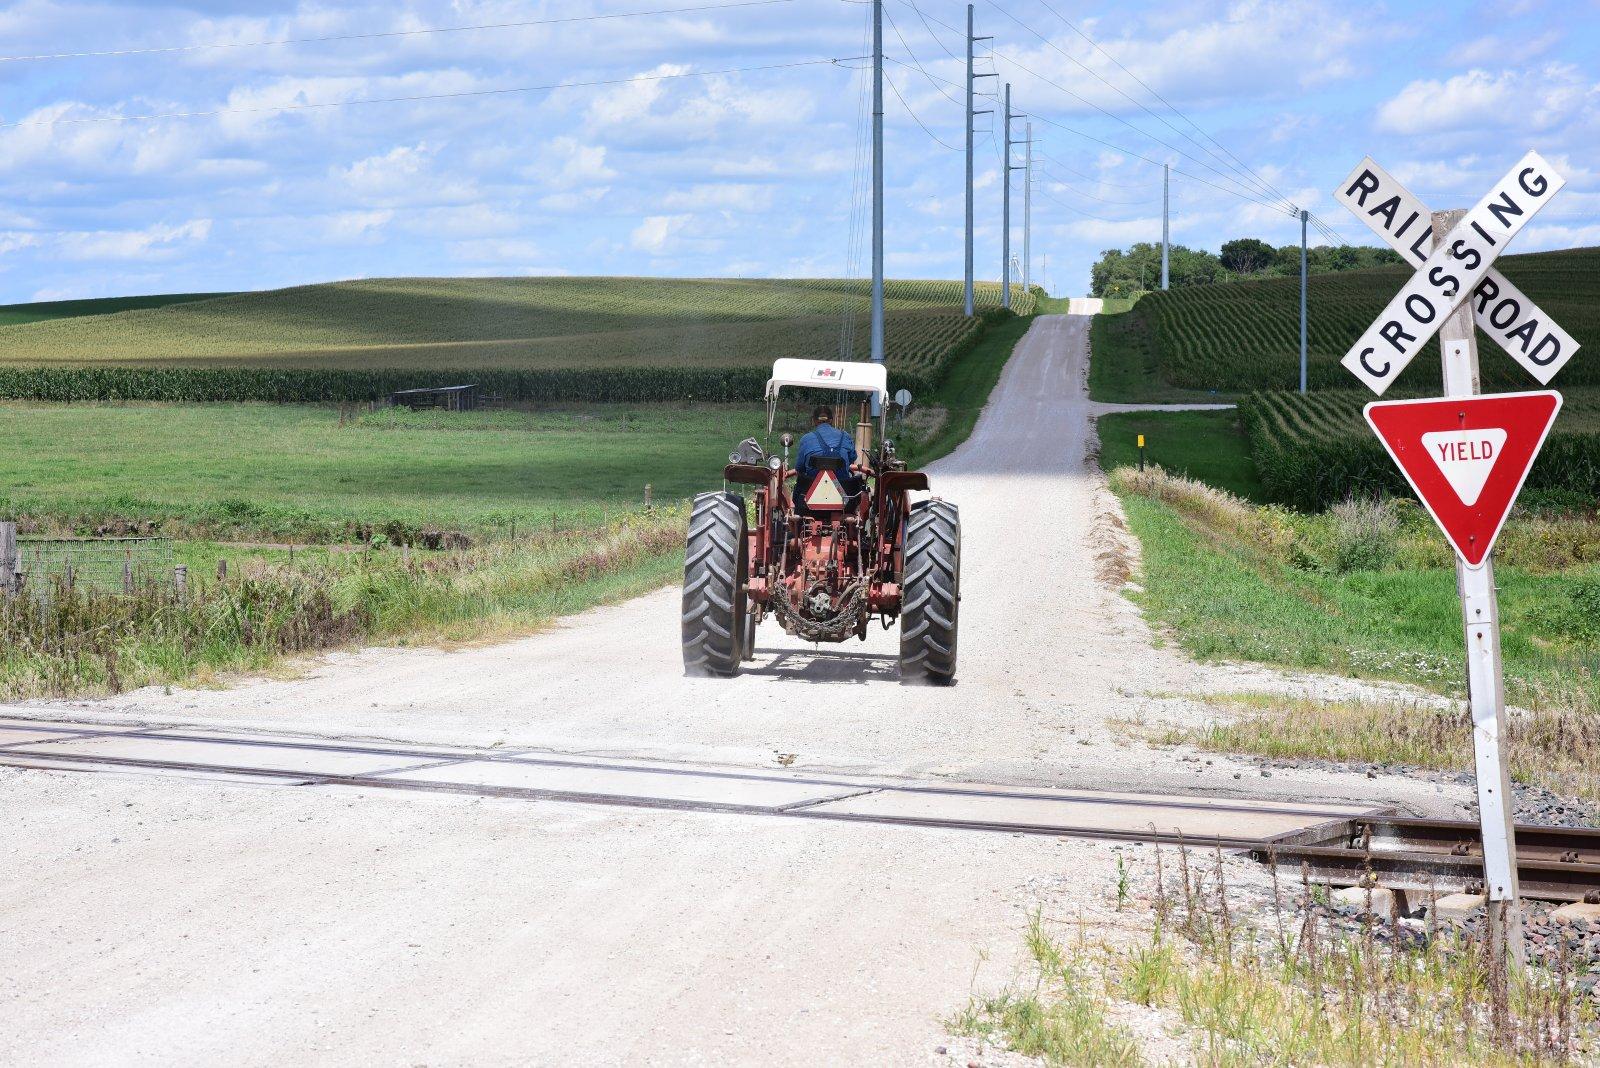 Tractor_080320.JPG